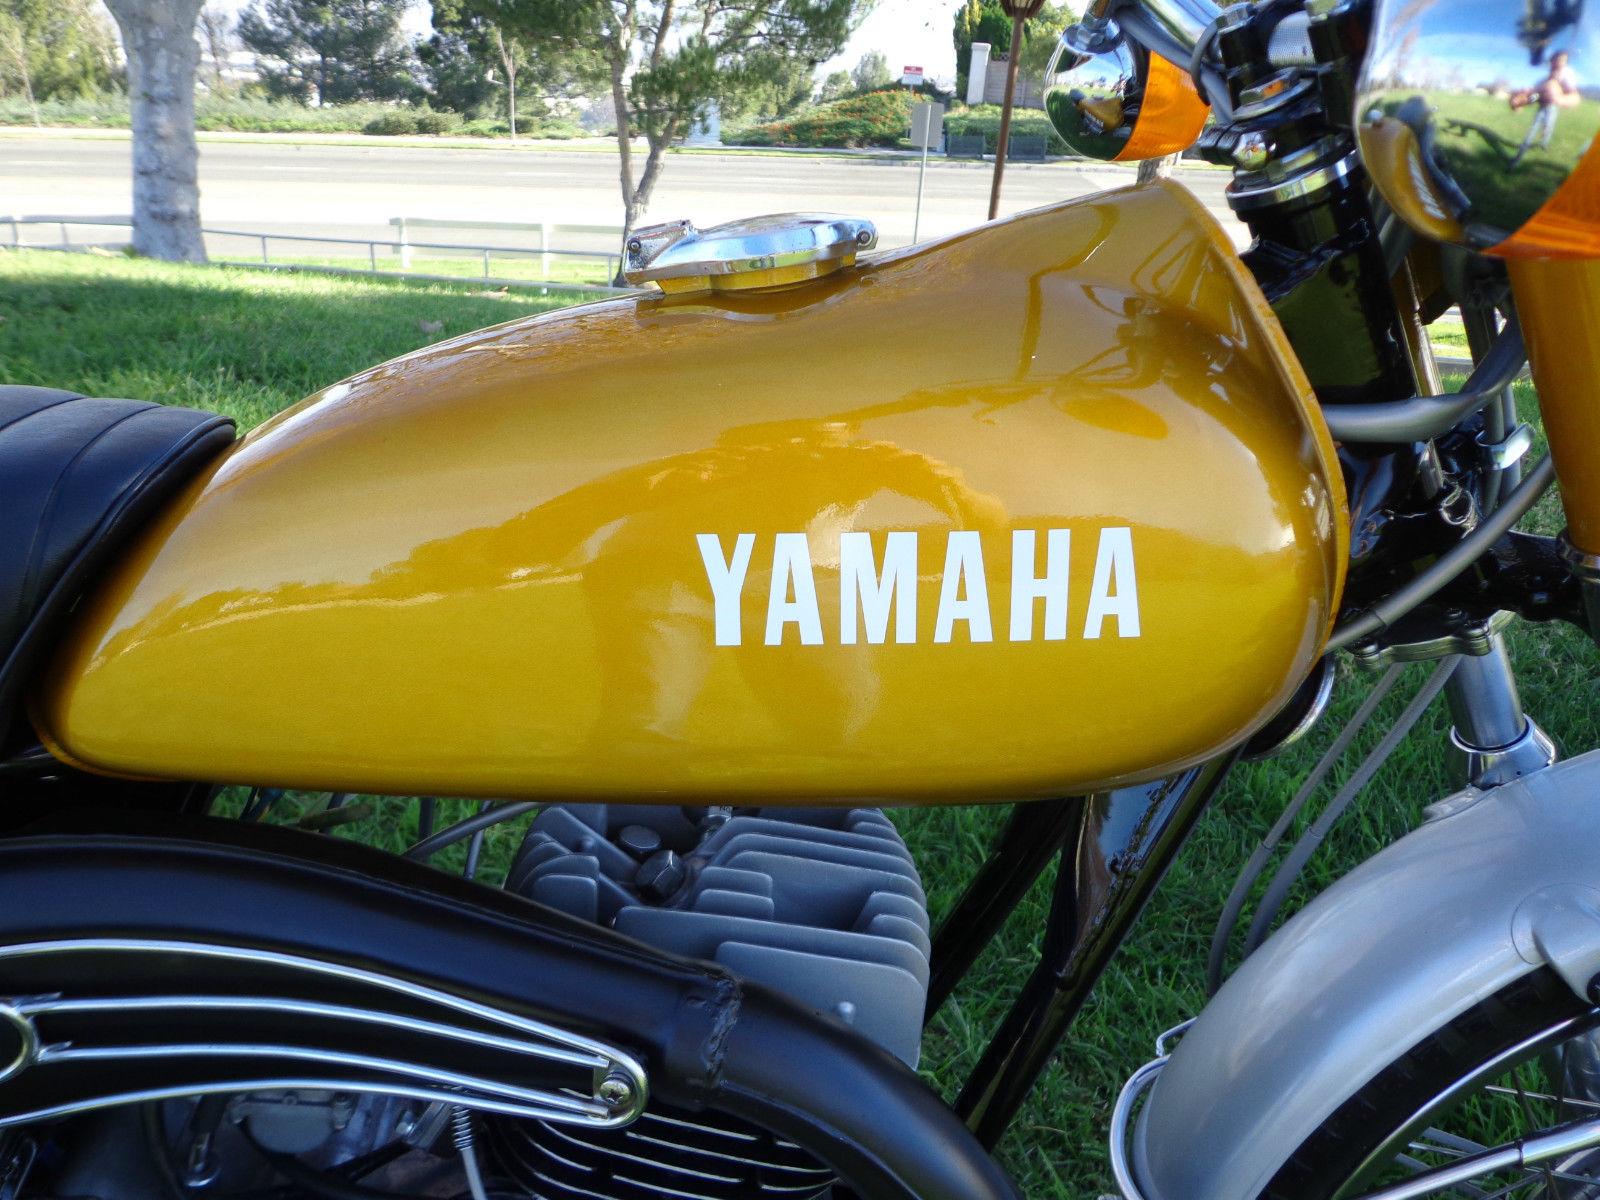 Yamaha DT250 - 1972 - Petrol Tank, Exhaust Shield and Gas Cap